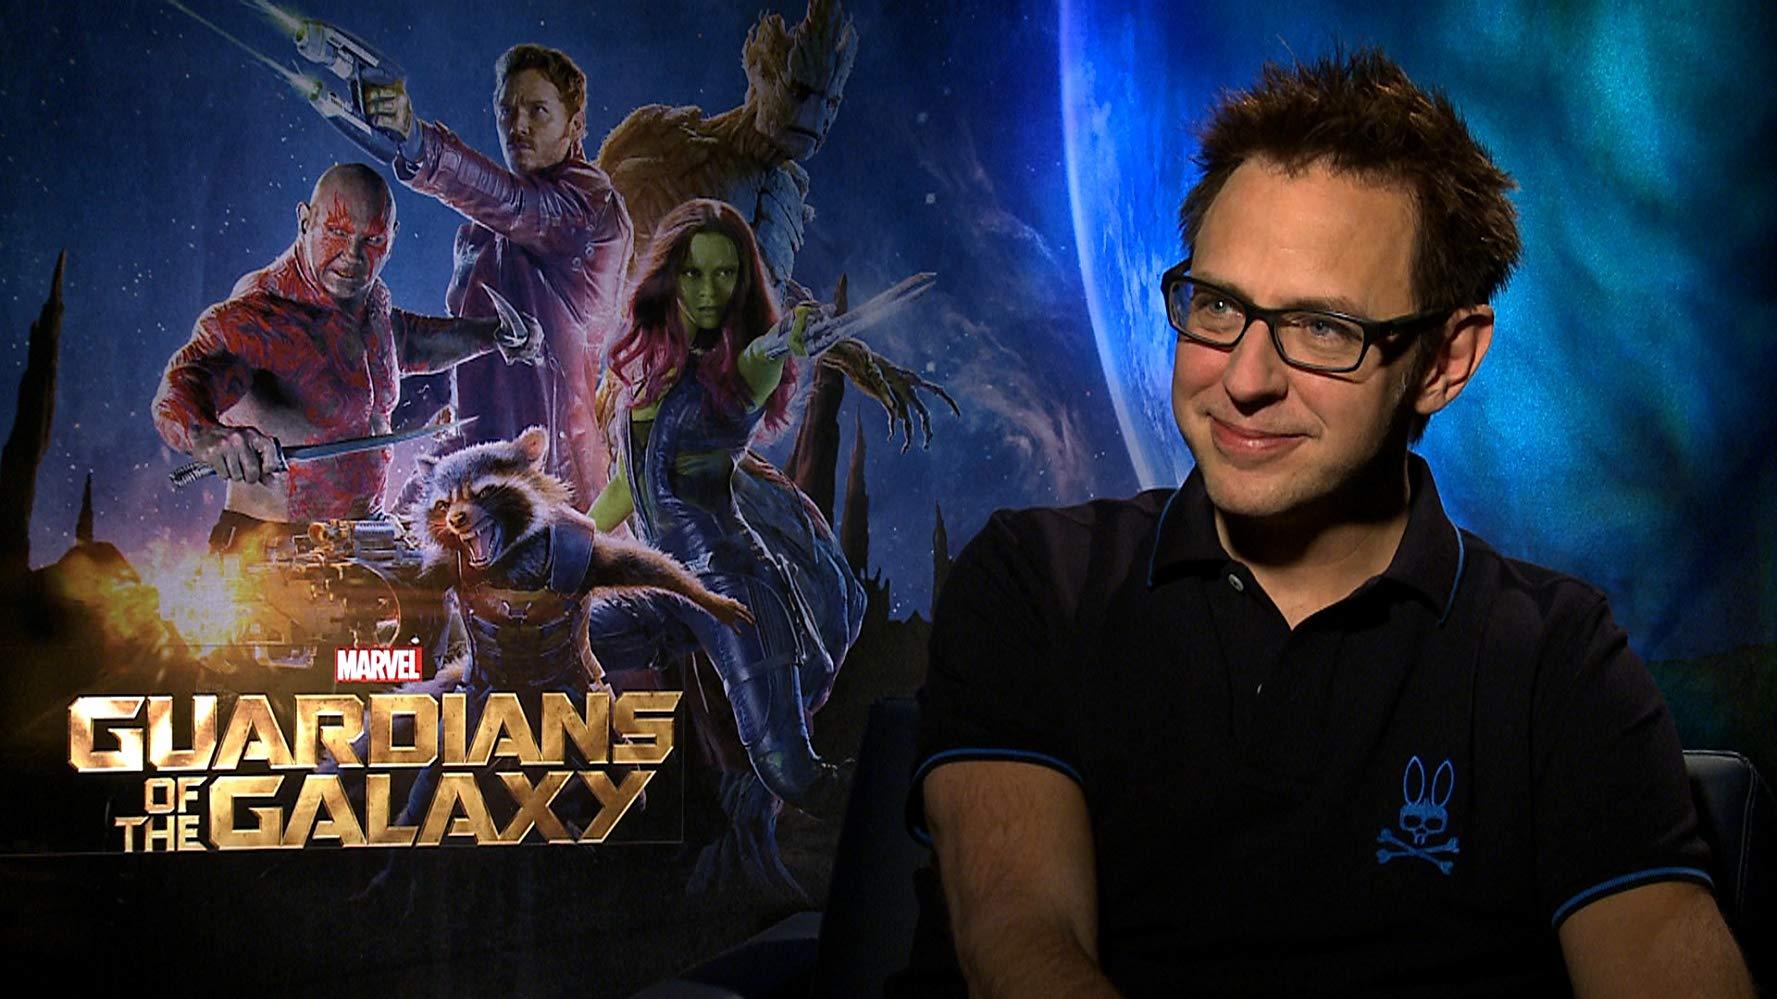 Disney Rekrut Balik James Gunn Demi 'Guardians of the Galaxy'